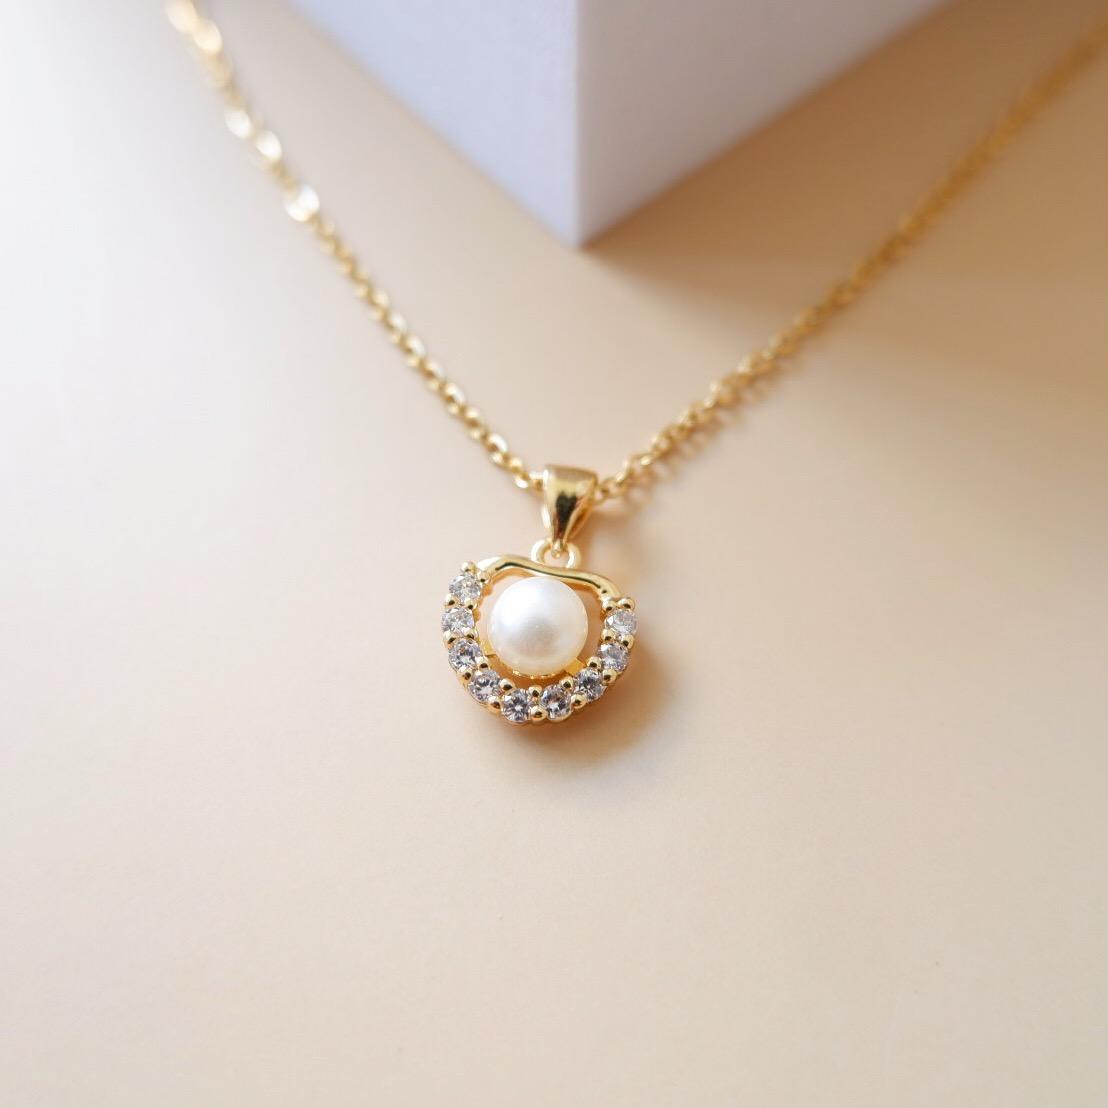 Cassia Pearl necklace2